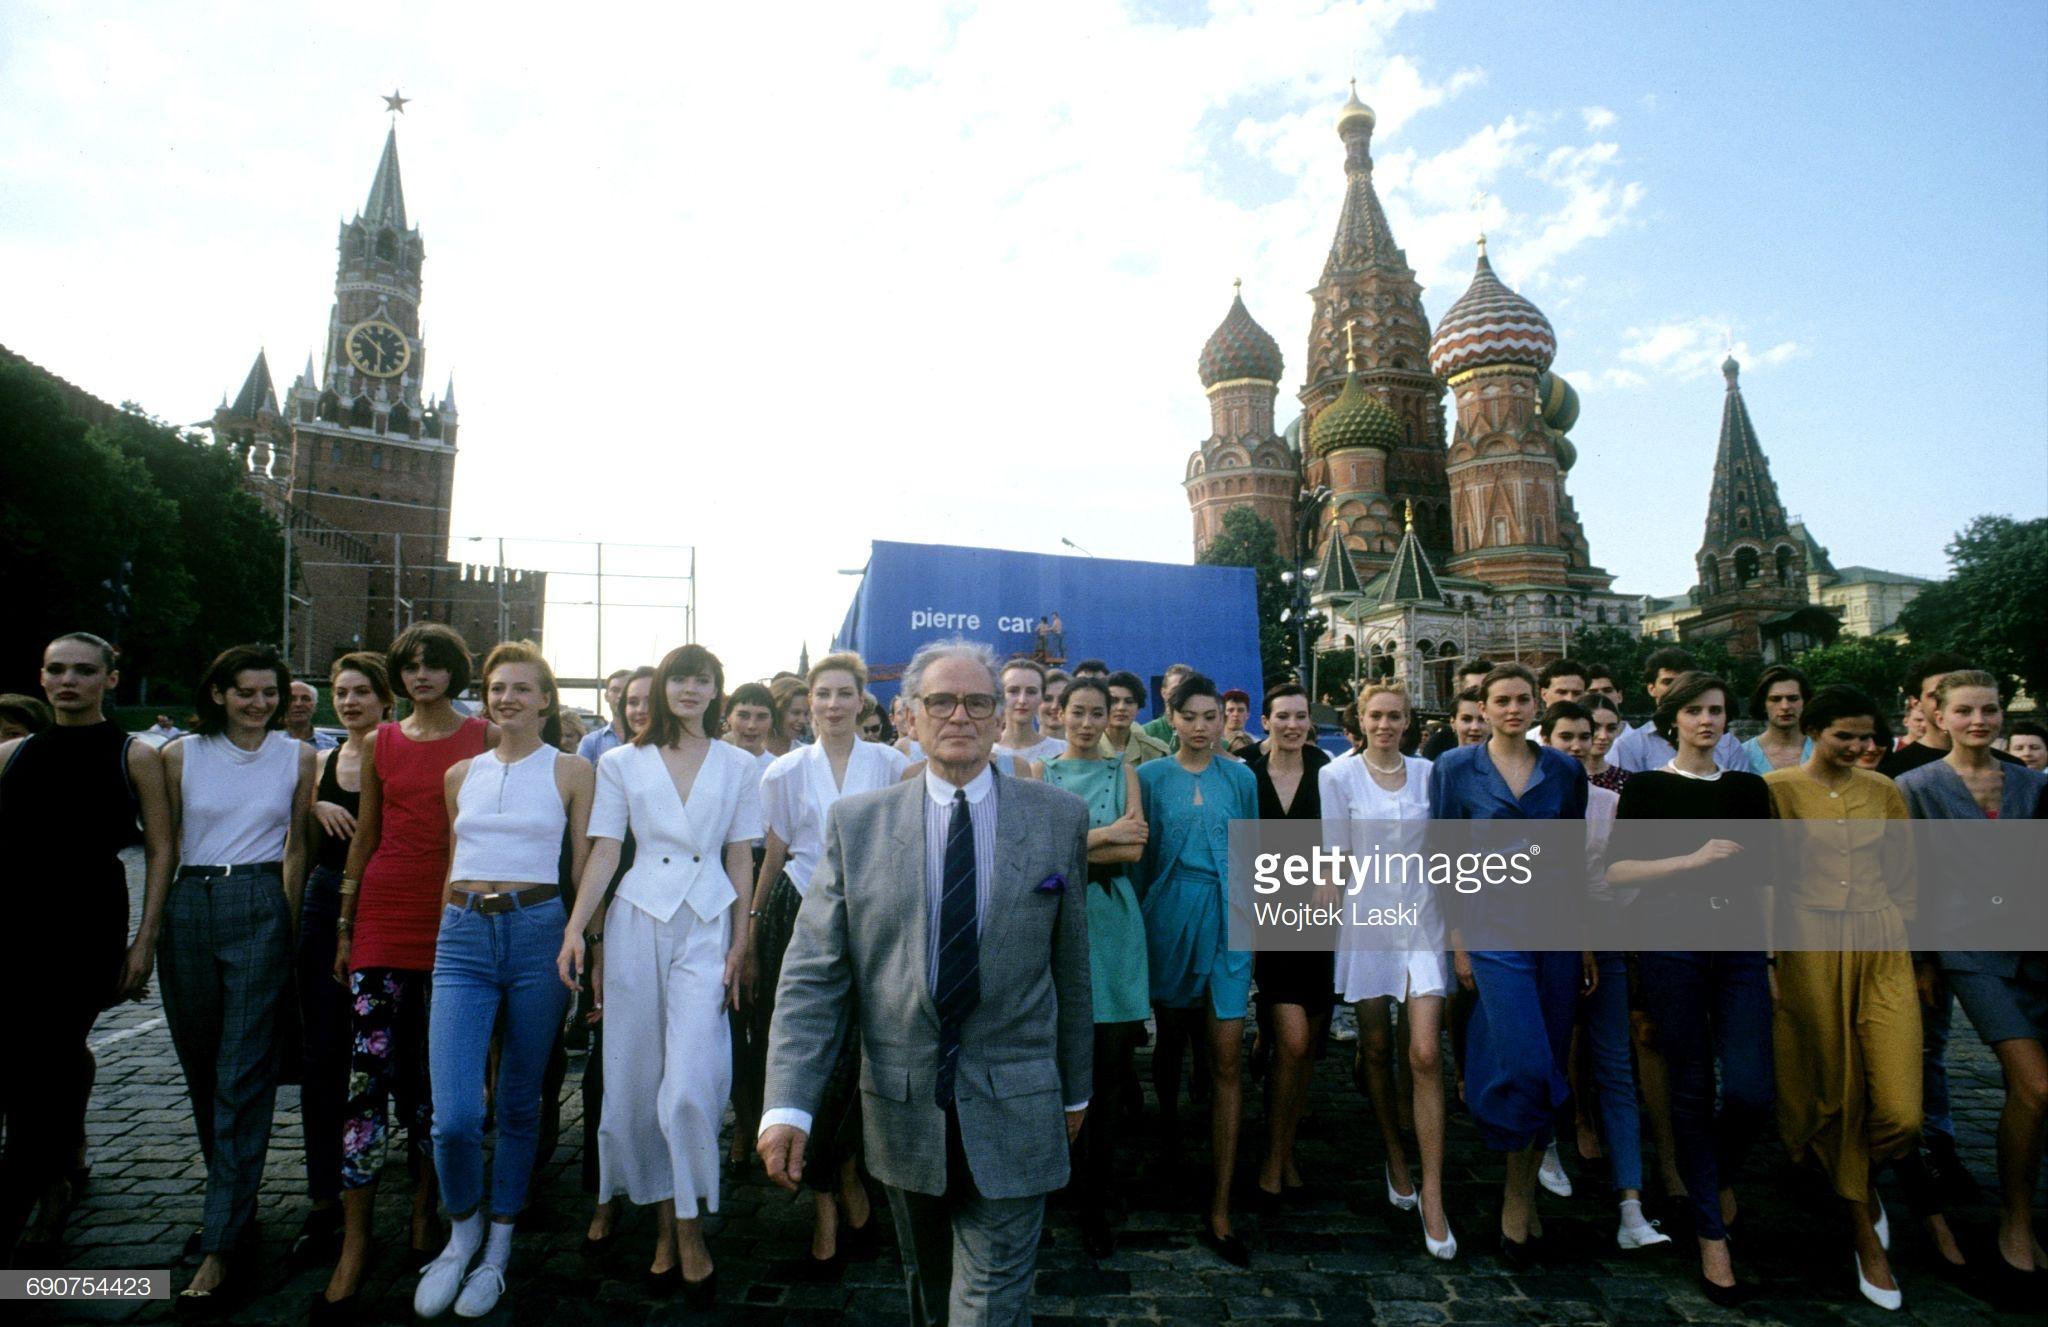 Пьер Карден с моделями на Красной площади в июне